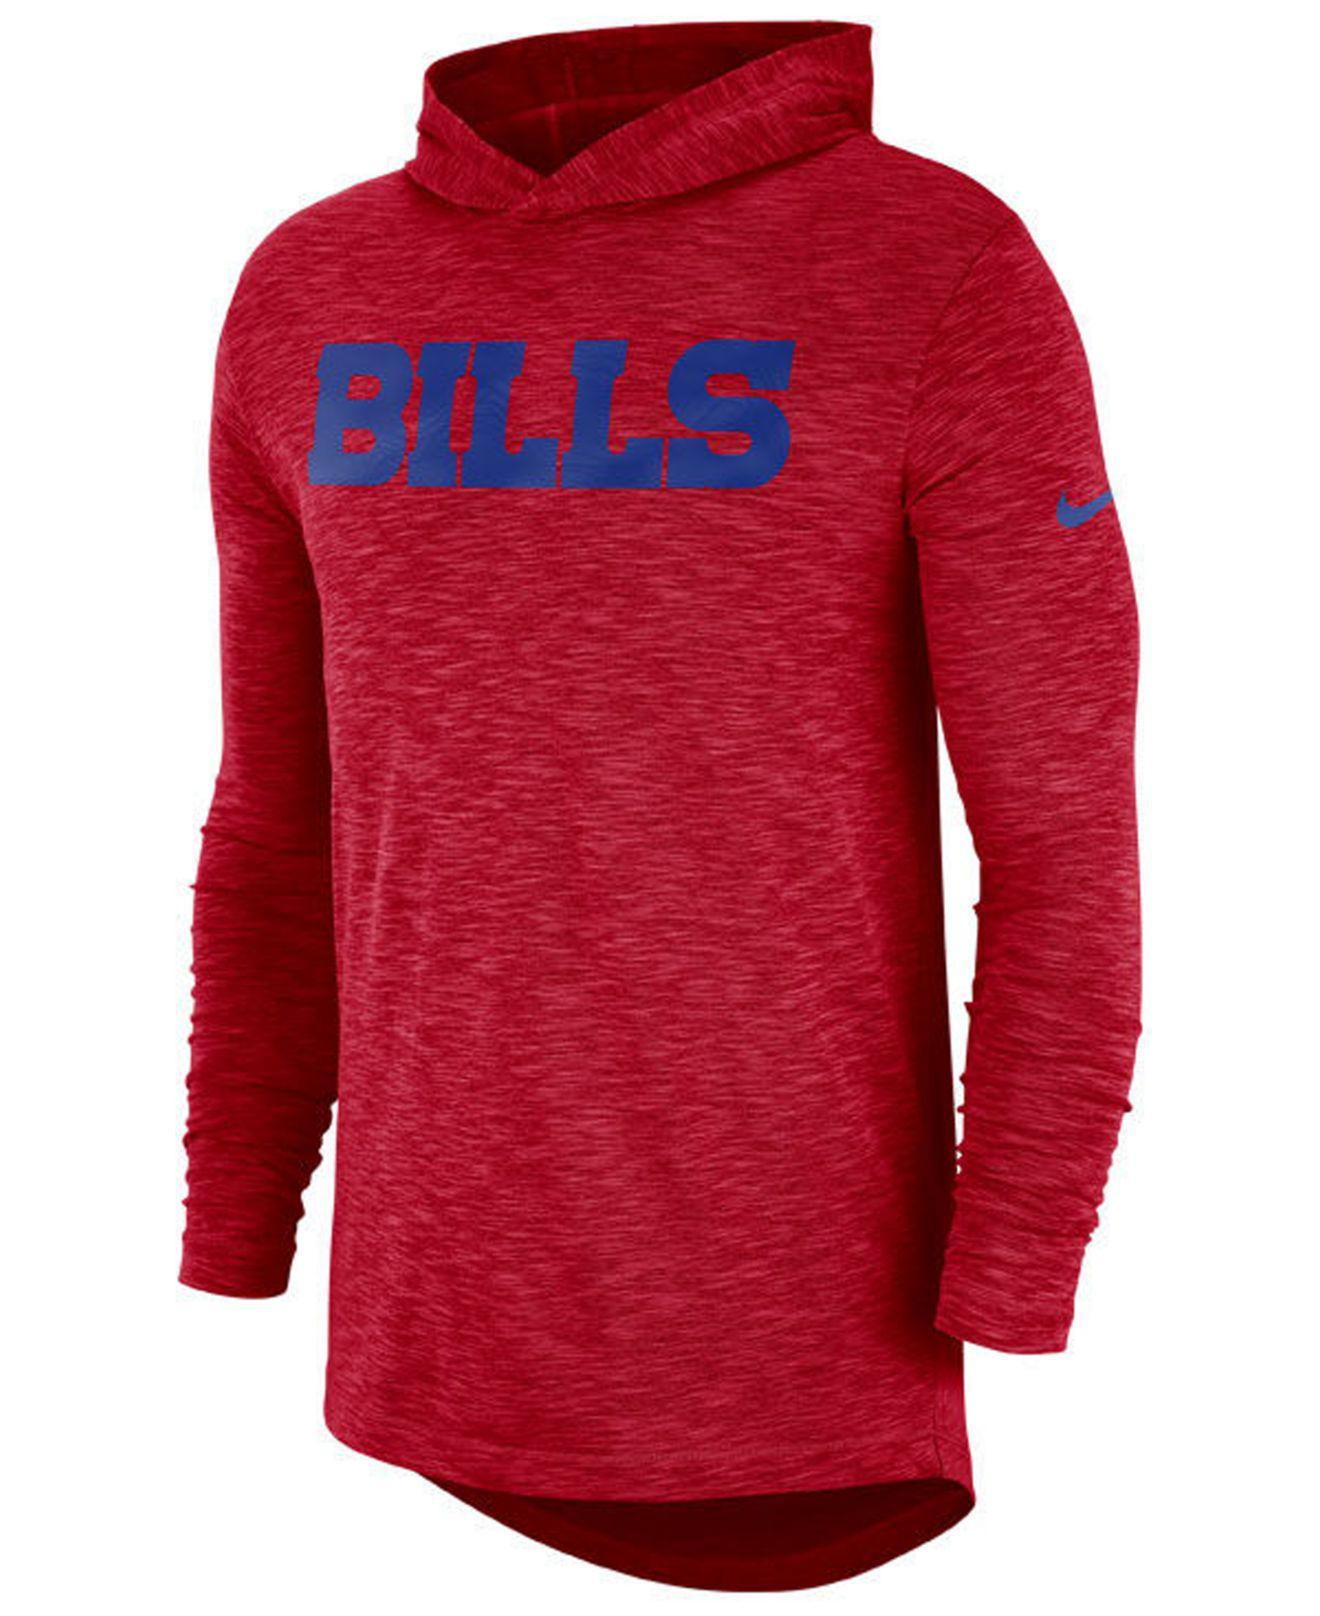 c118639e3c66 Lyst - Nike Buffalo Bills Dri-fit Cotton Slub On-field Hooded T ...